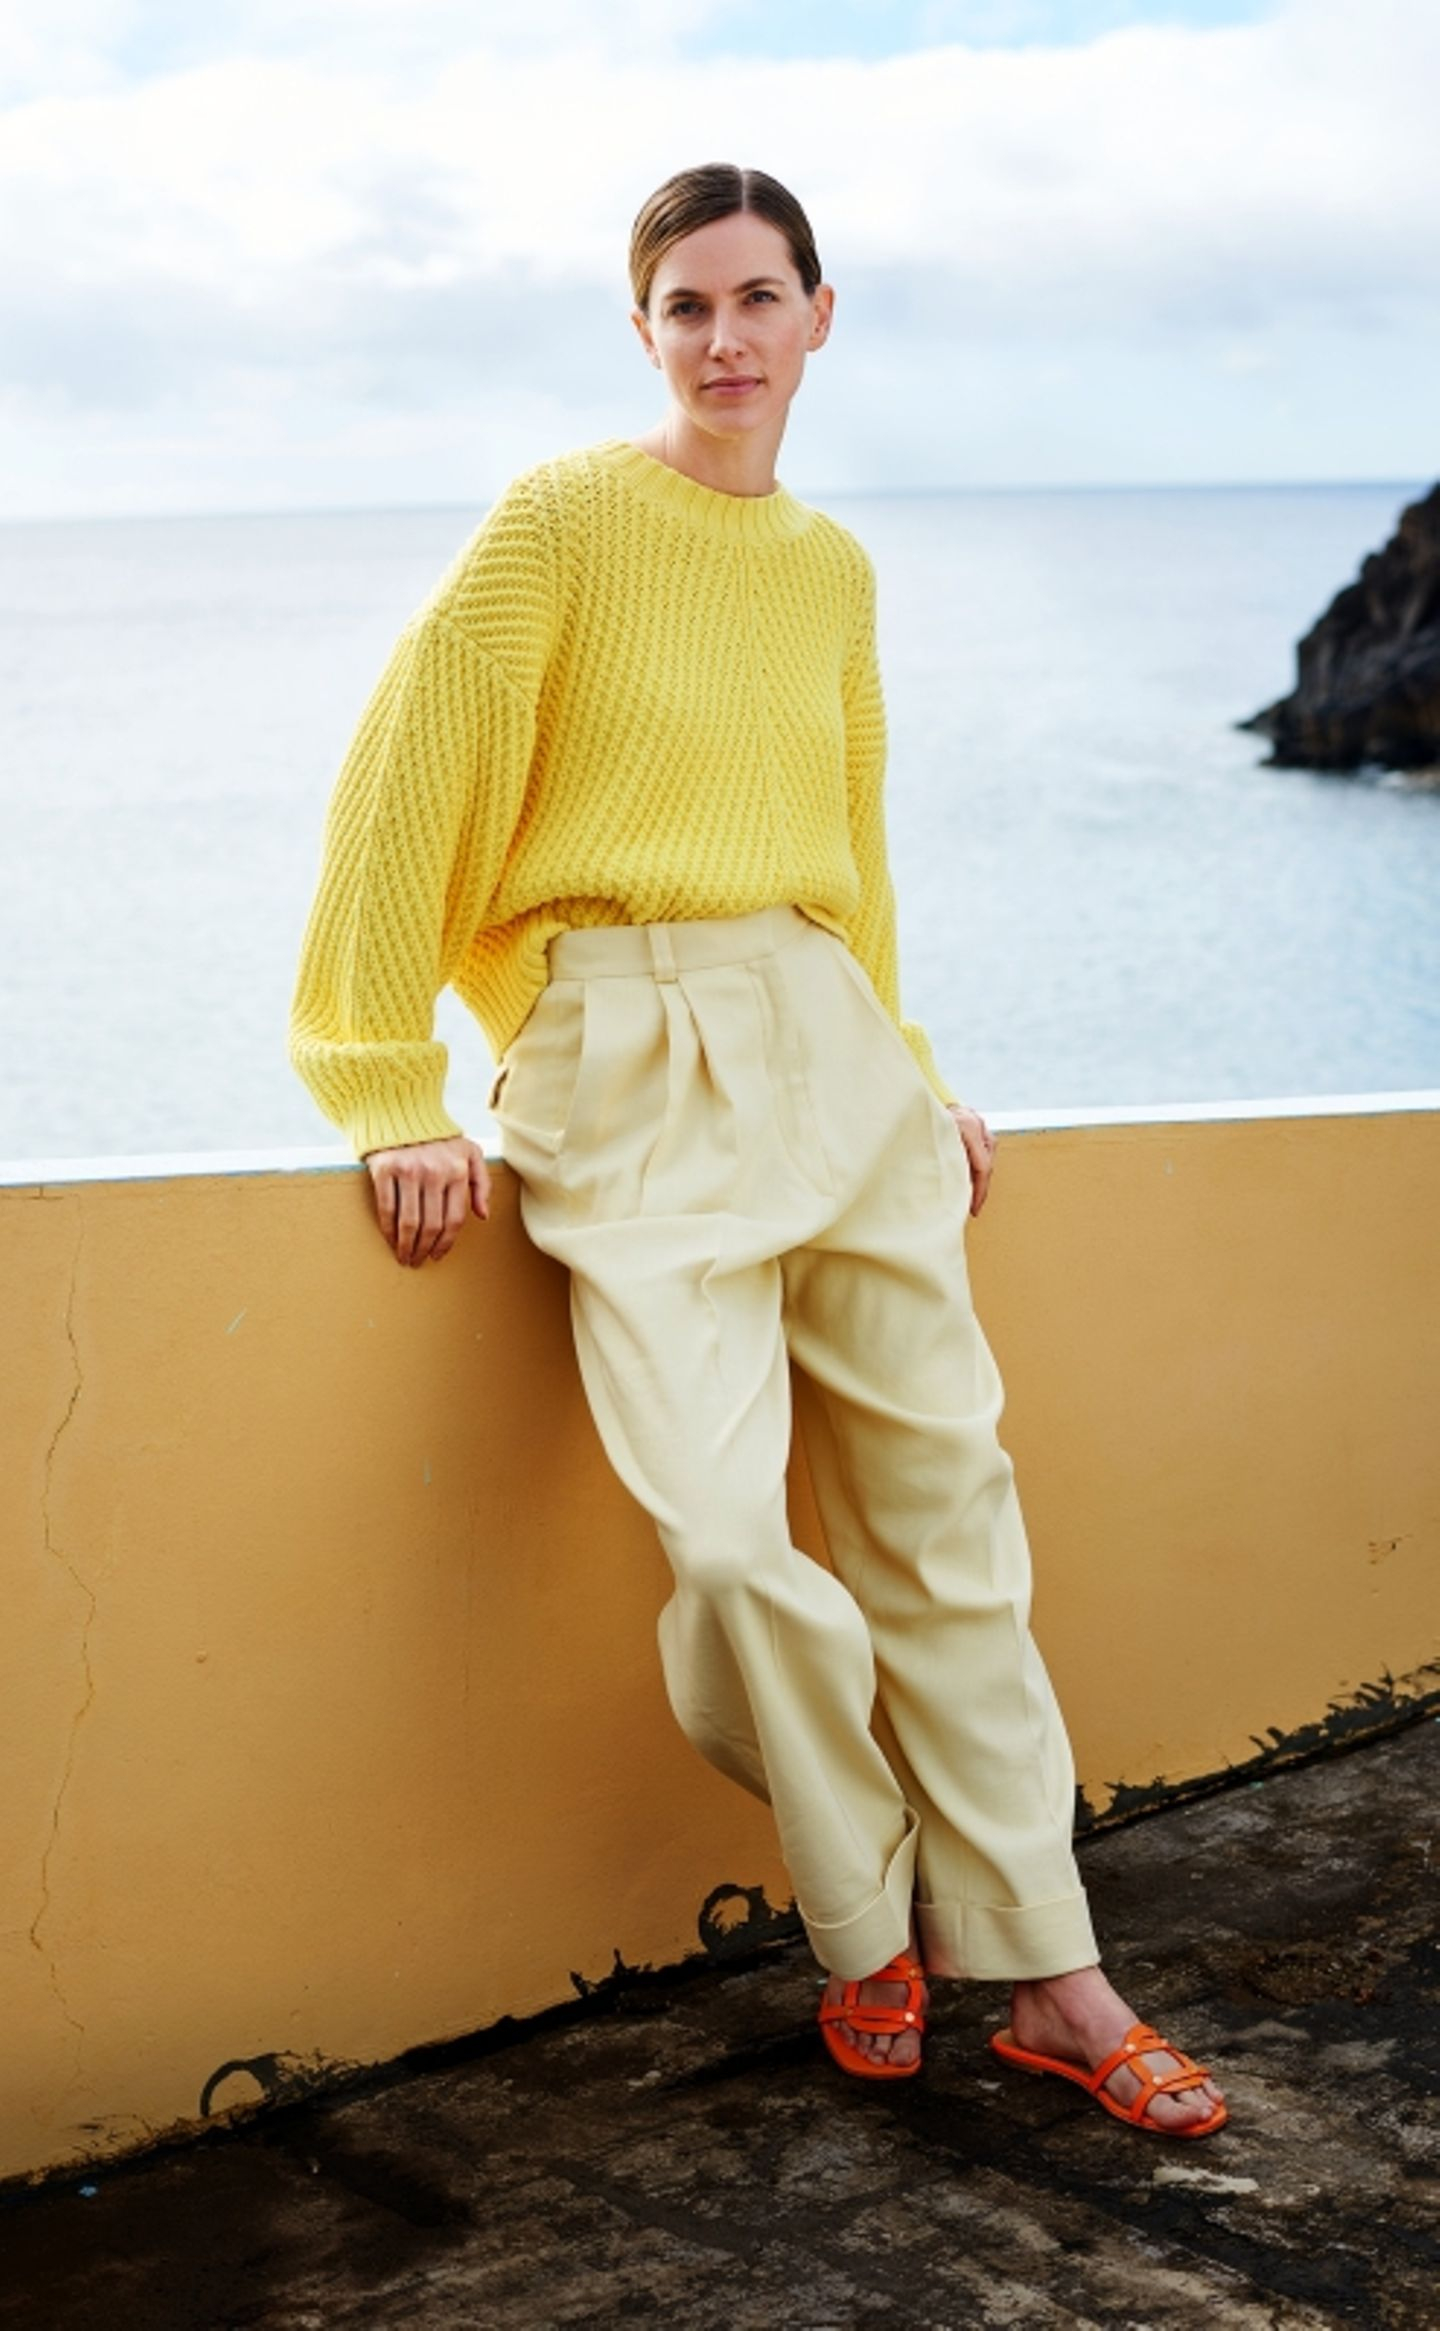 Pastelltöne: Gelbes Outfit